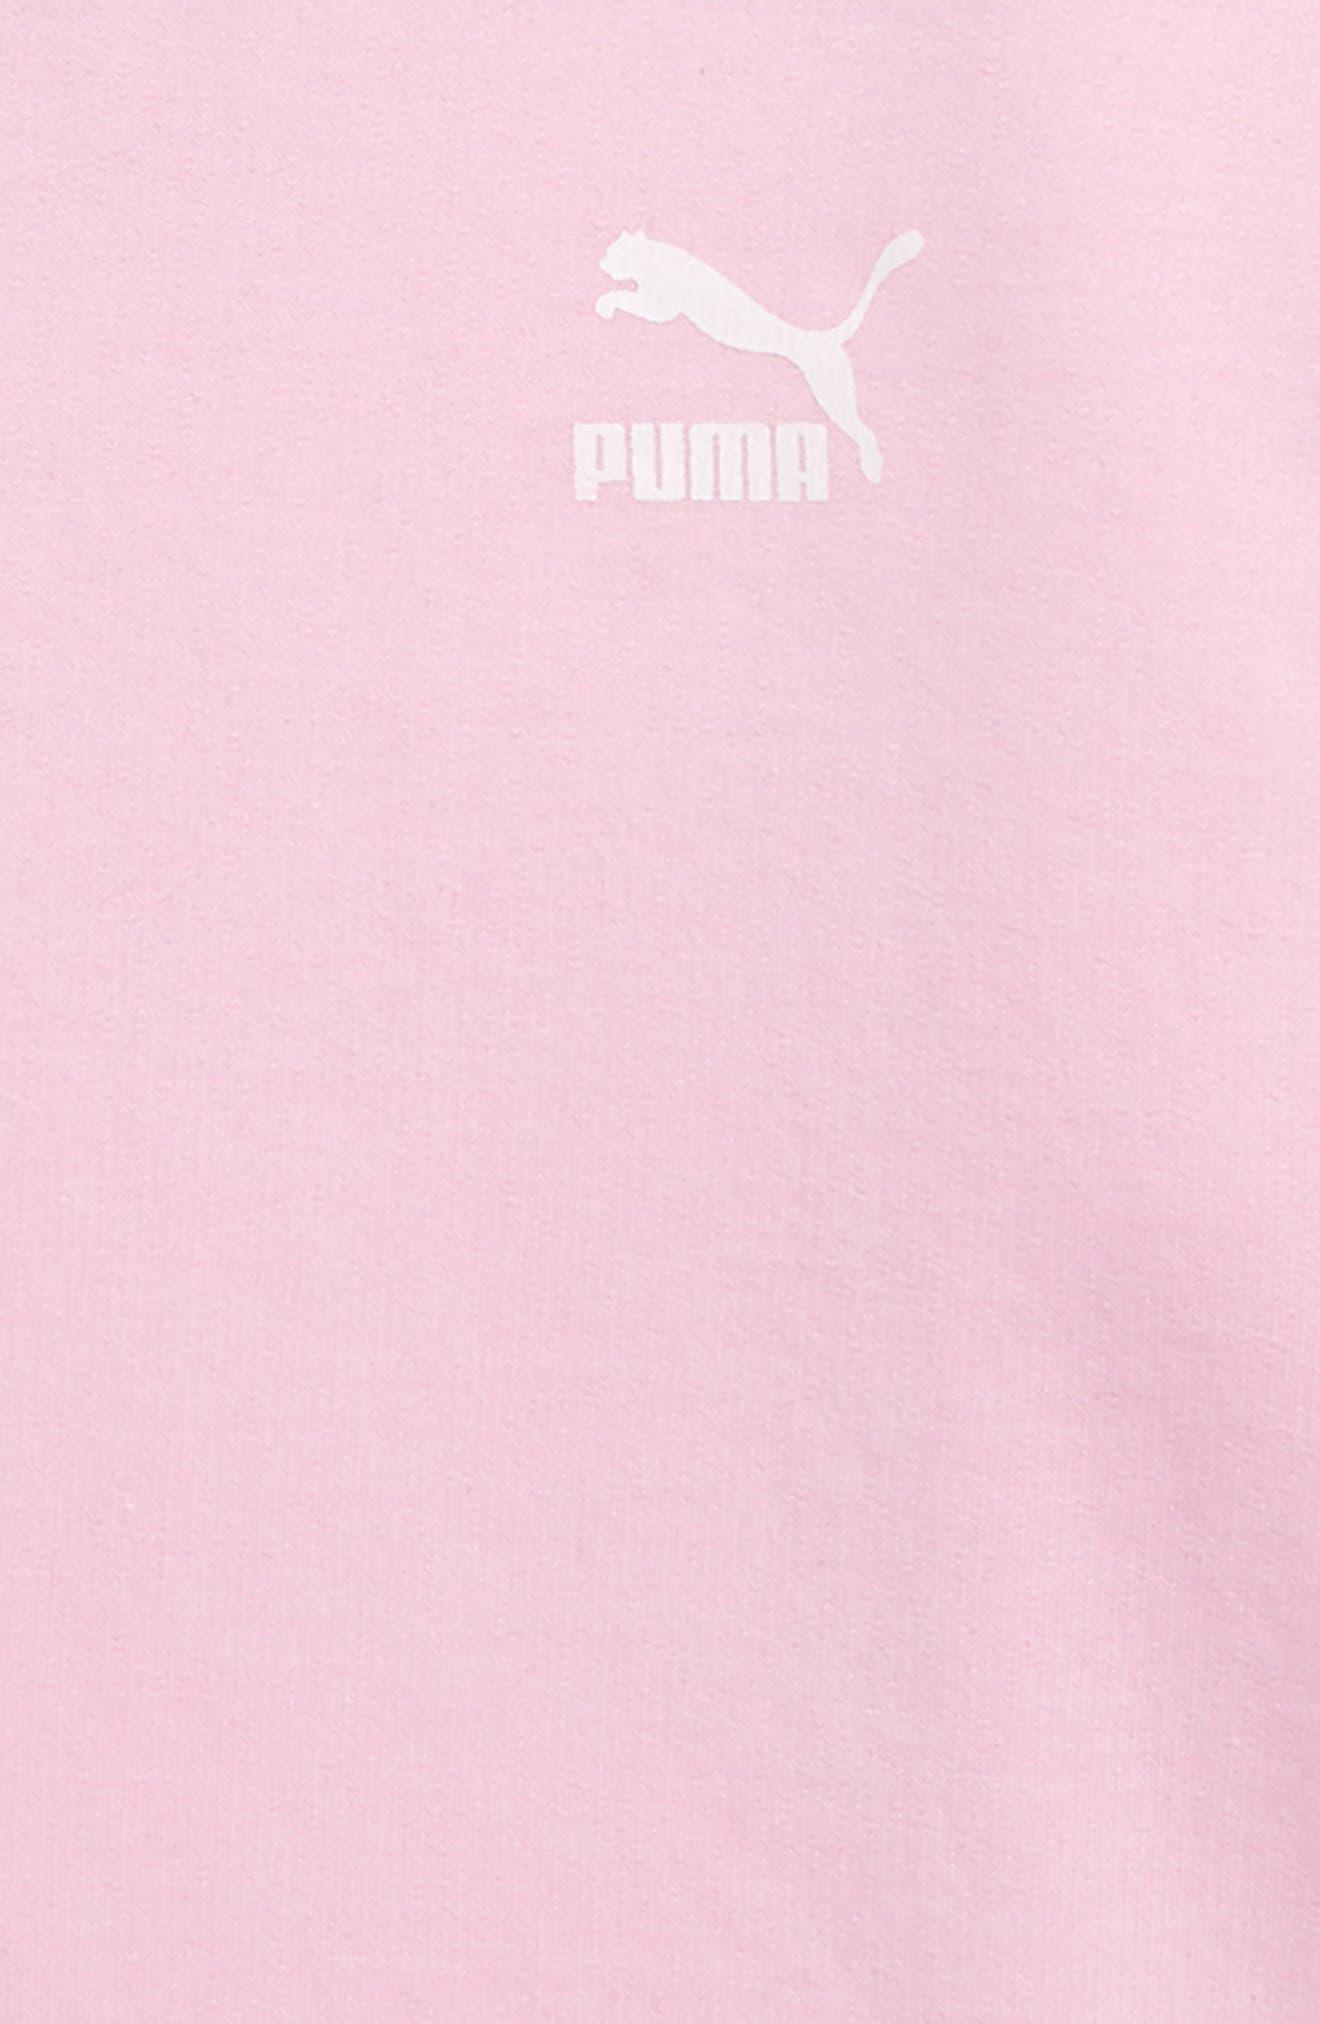 PUMA,                             Oversize Fleece Pullover,                             Alternate thumbnail 3, color,                             PALE PINK